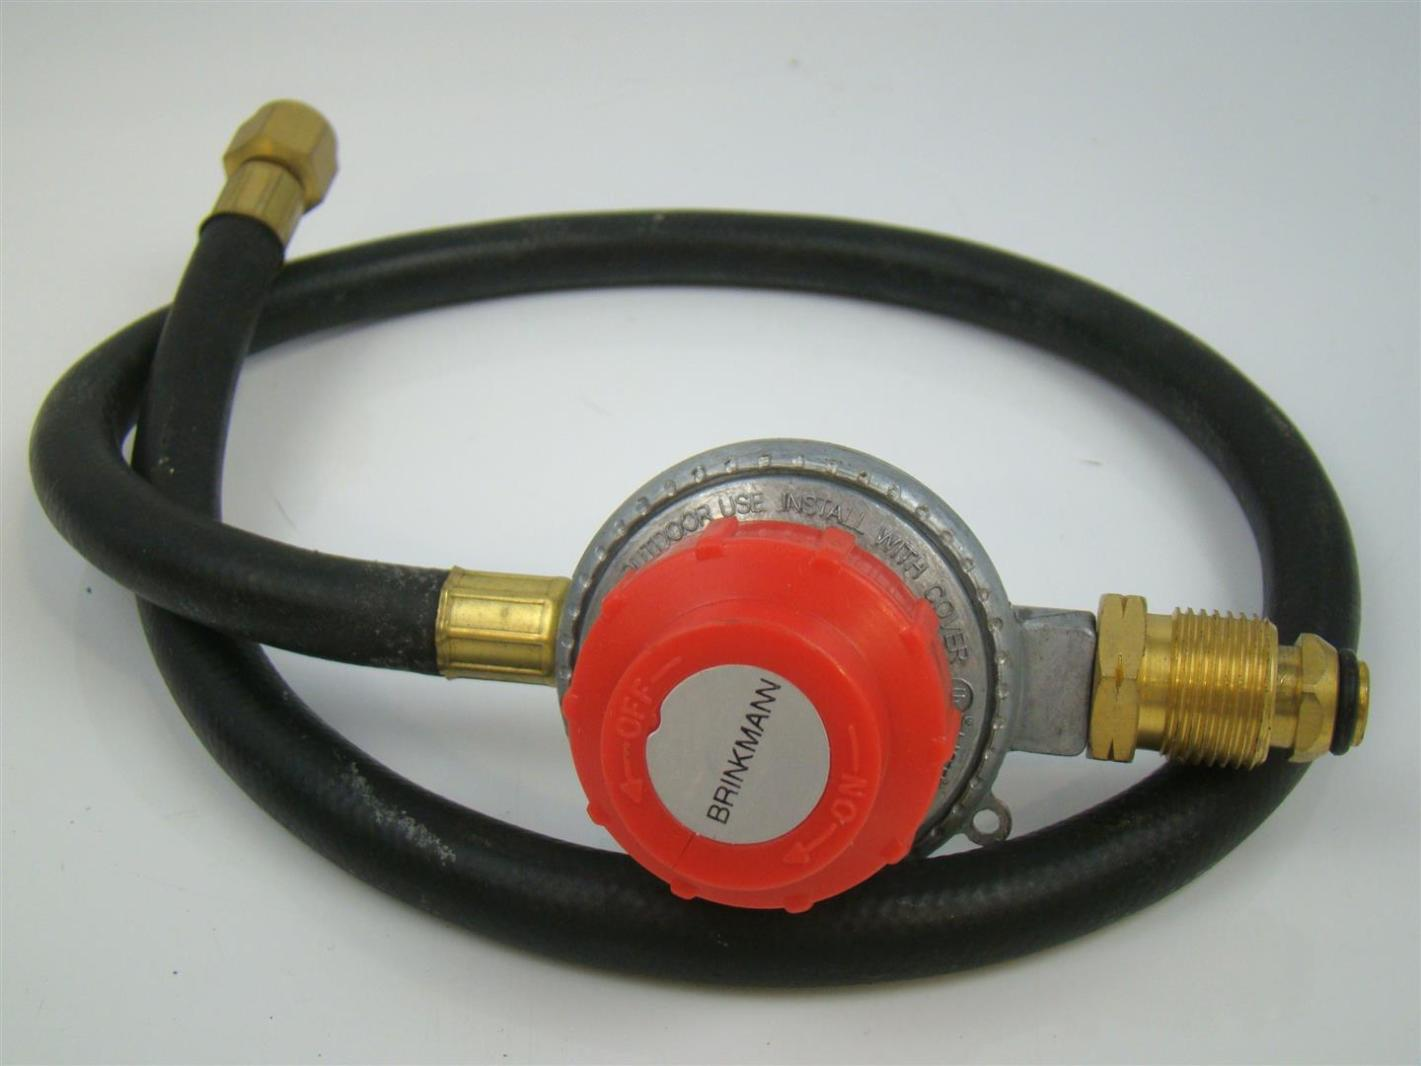 High Pressure Regulator : Brinkmann lp propane adjustable high pressure regulator